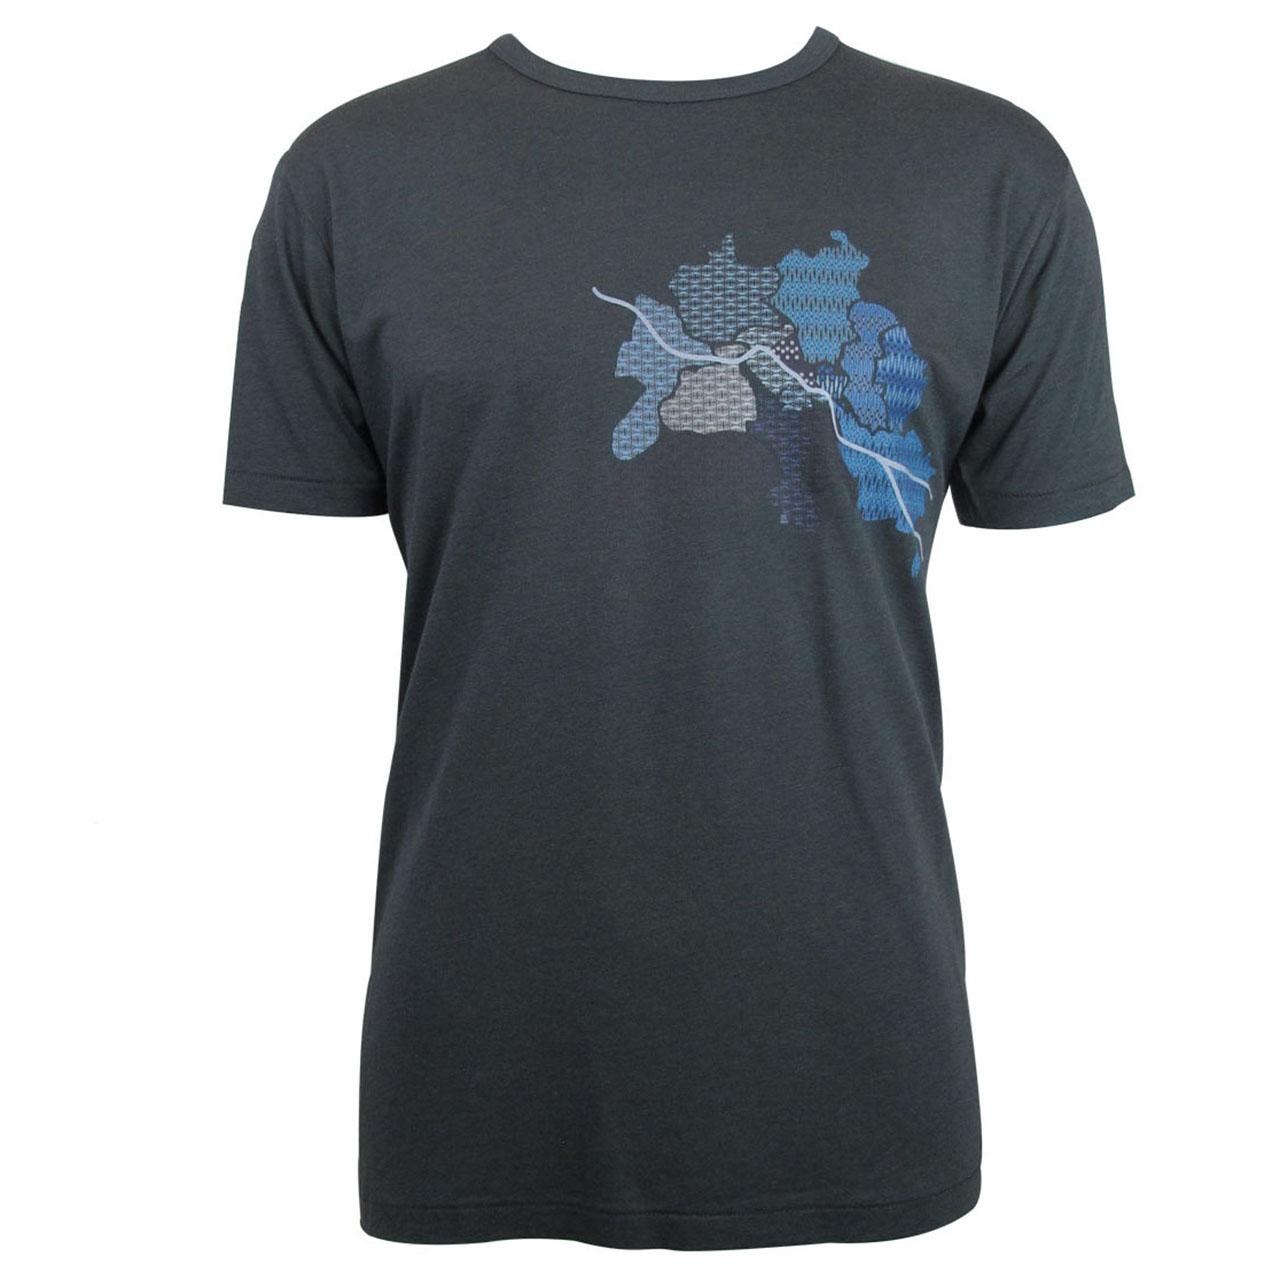 T-Shirt Berlin Map grau